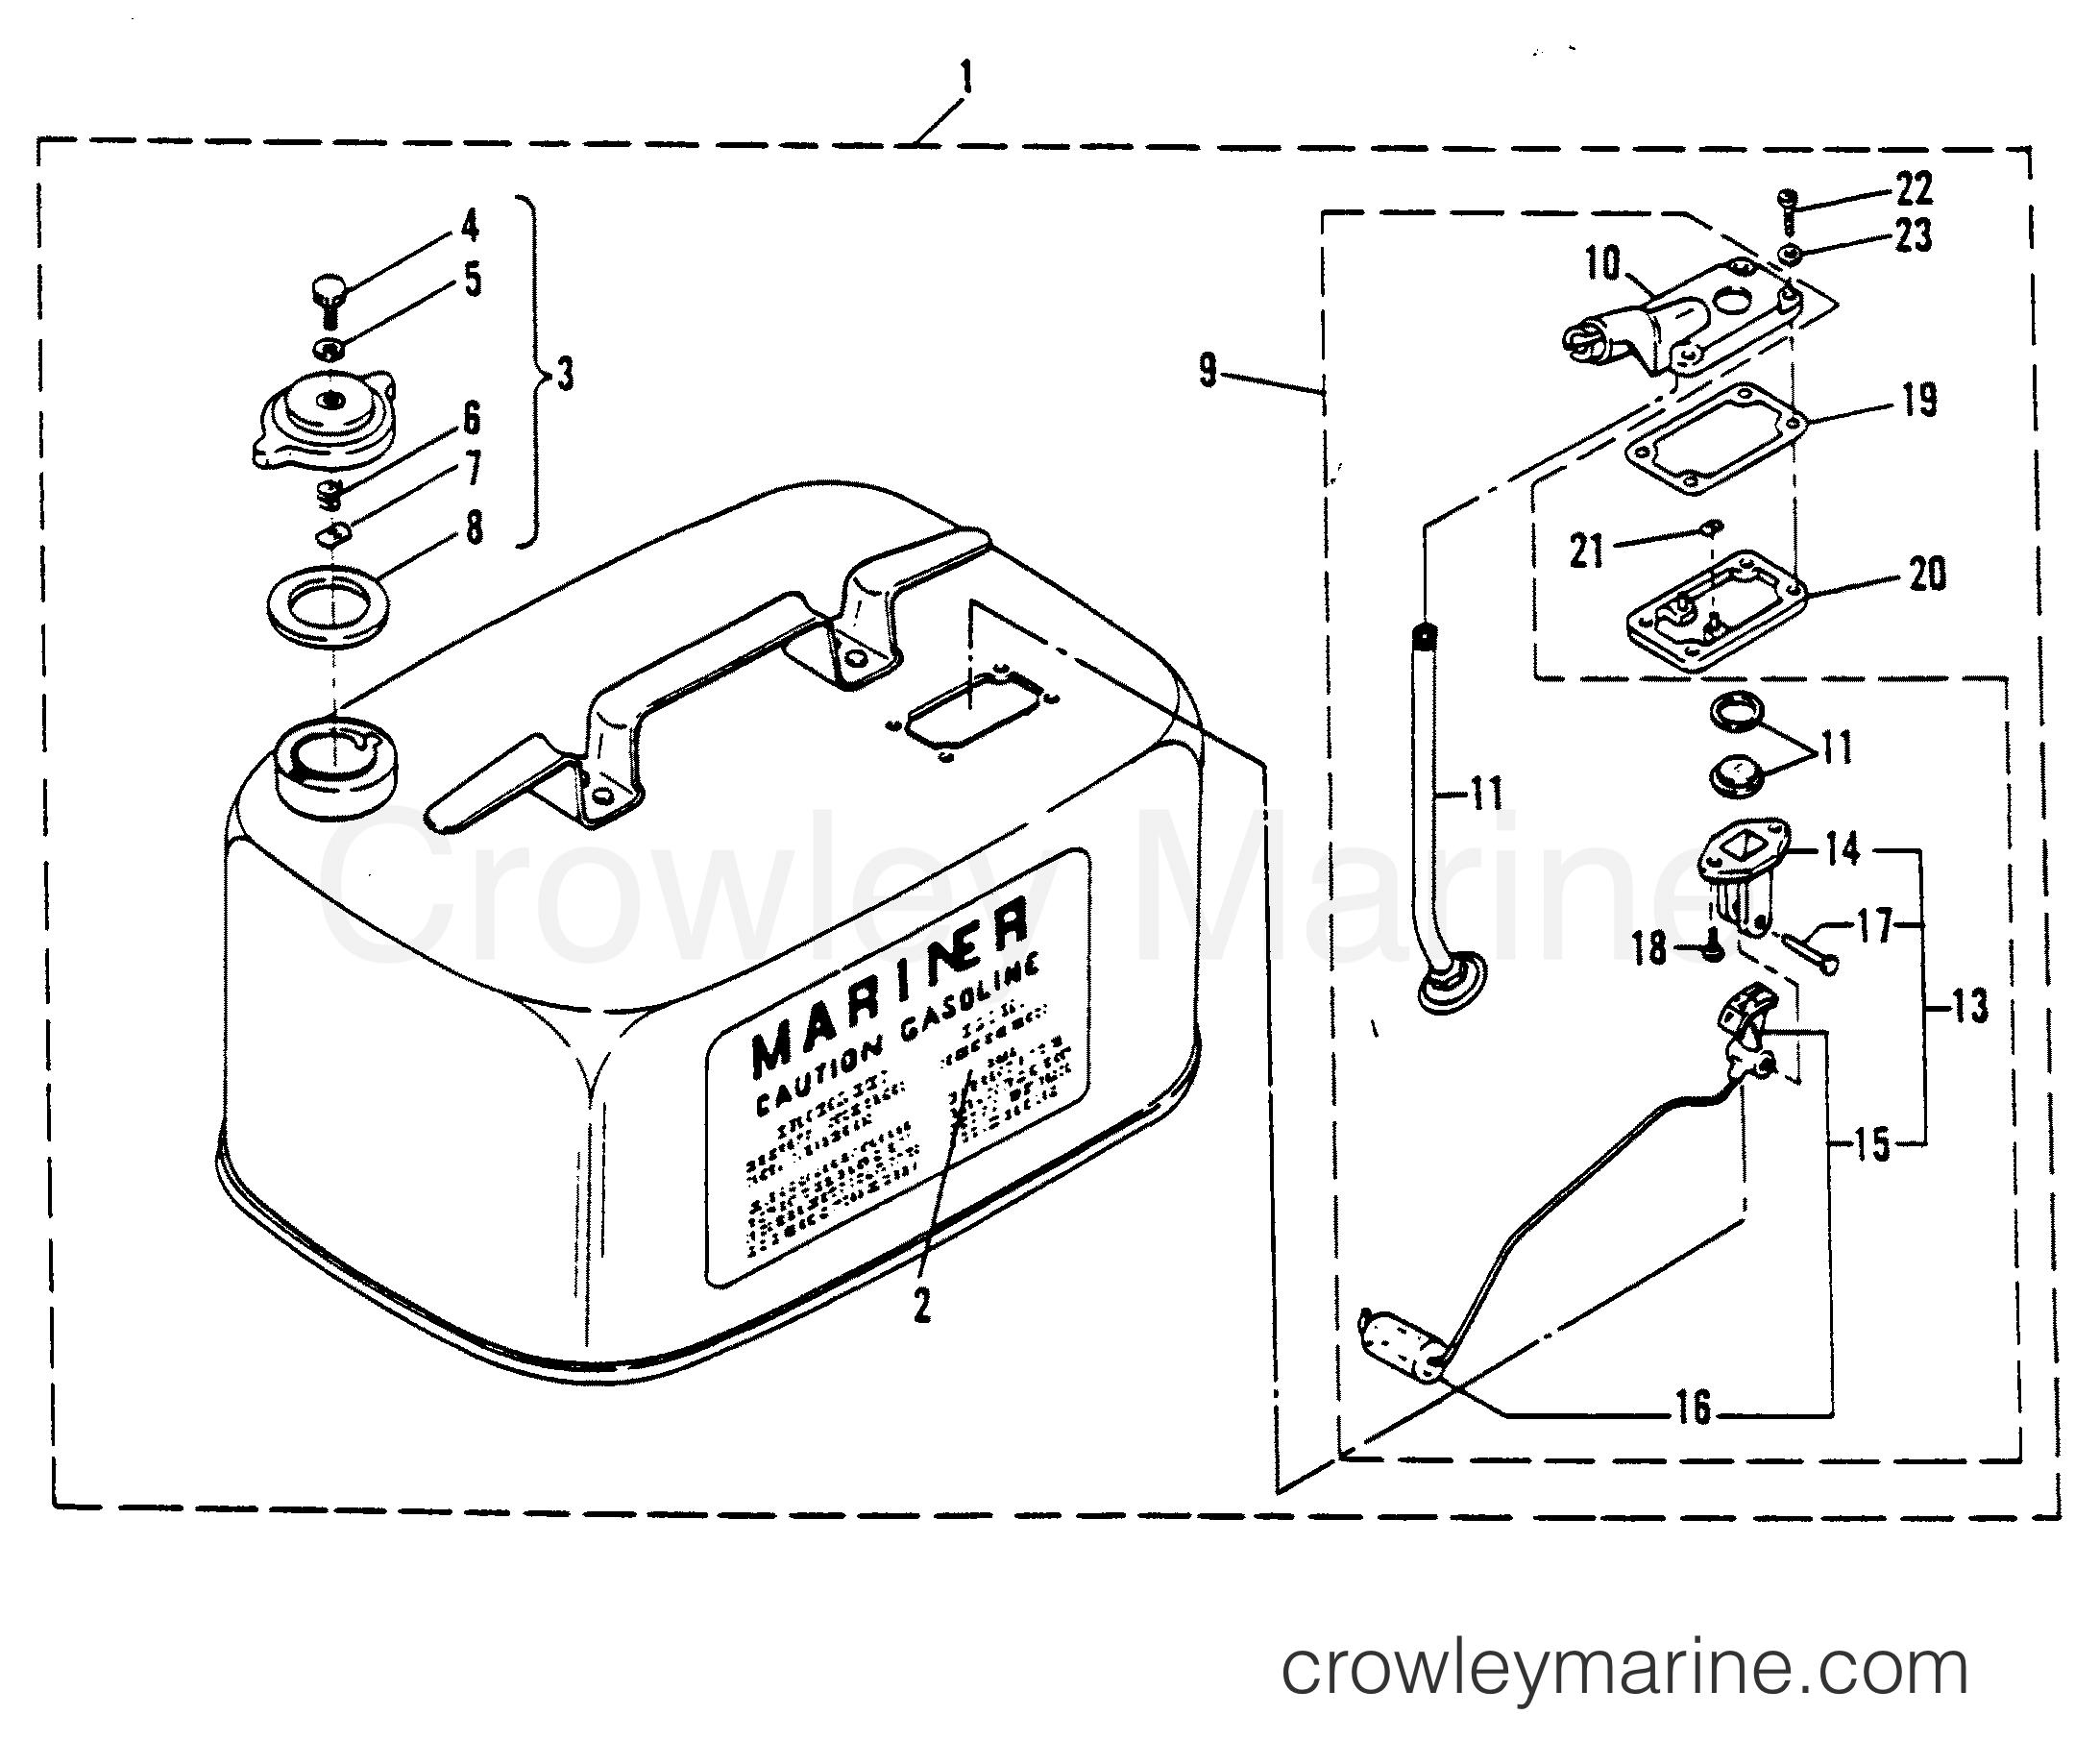 Fuel Tank Not Original Equipment Tank Serial Range